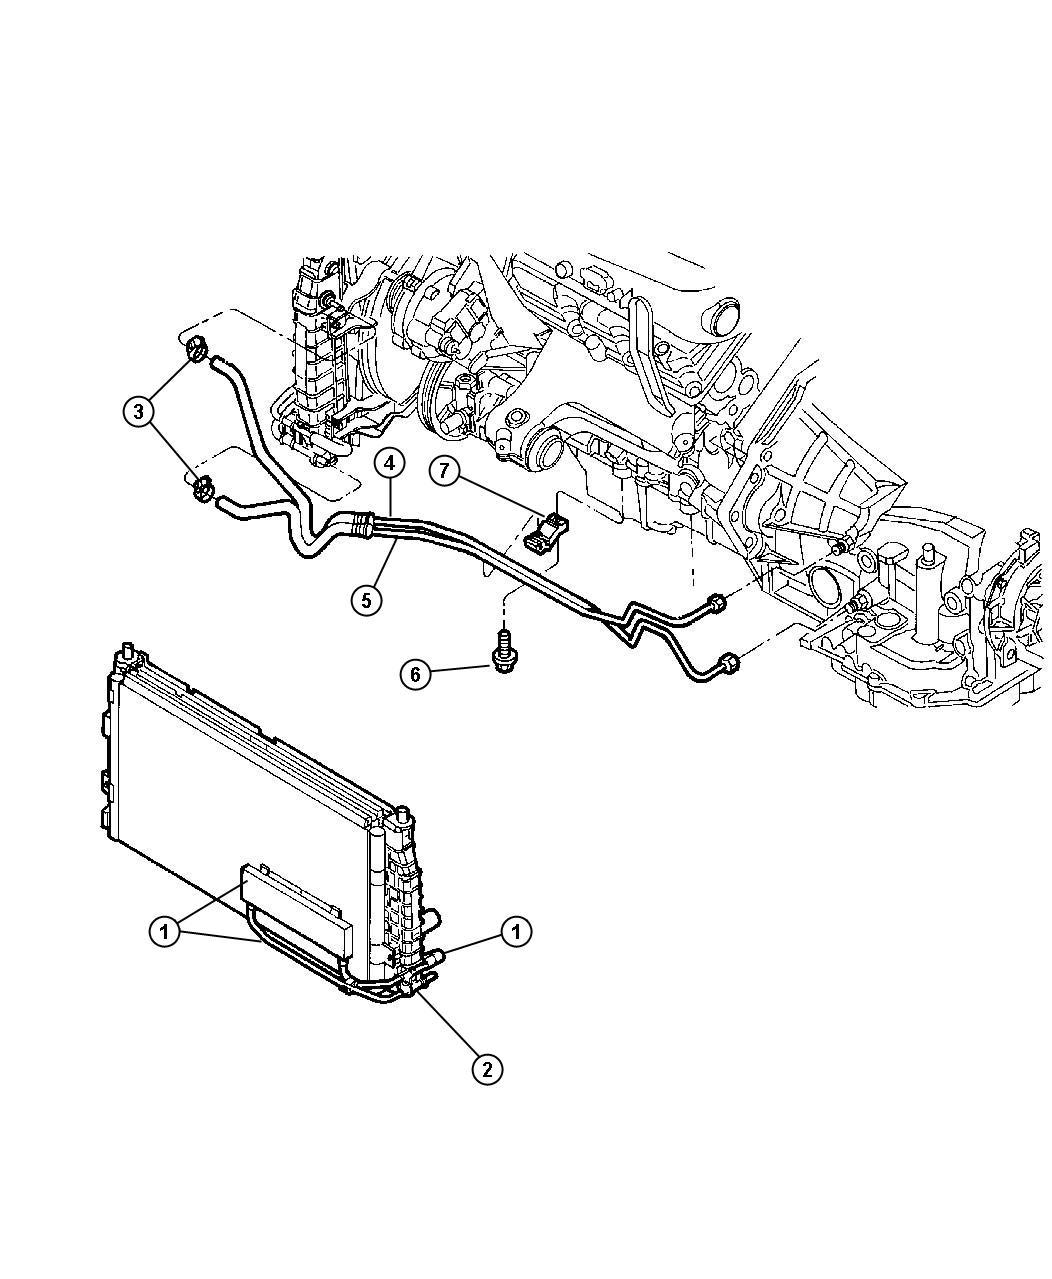 Dodge Intrepid Es 4 Dr 3 2l V6 Sohc 24 Valve Mpi 4